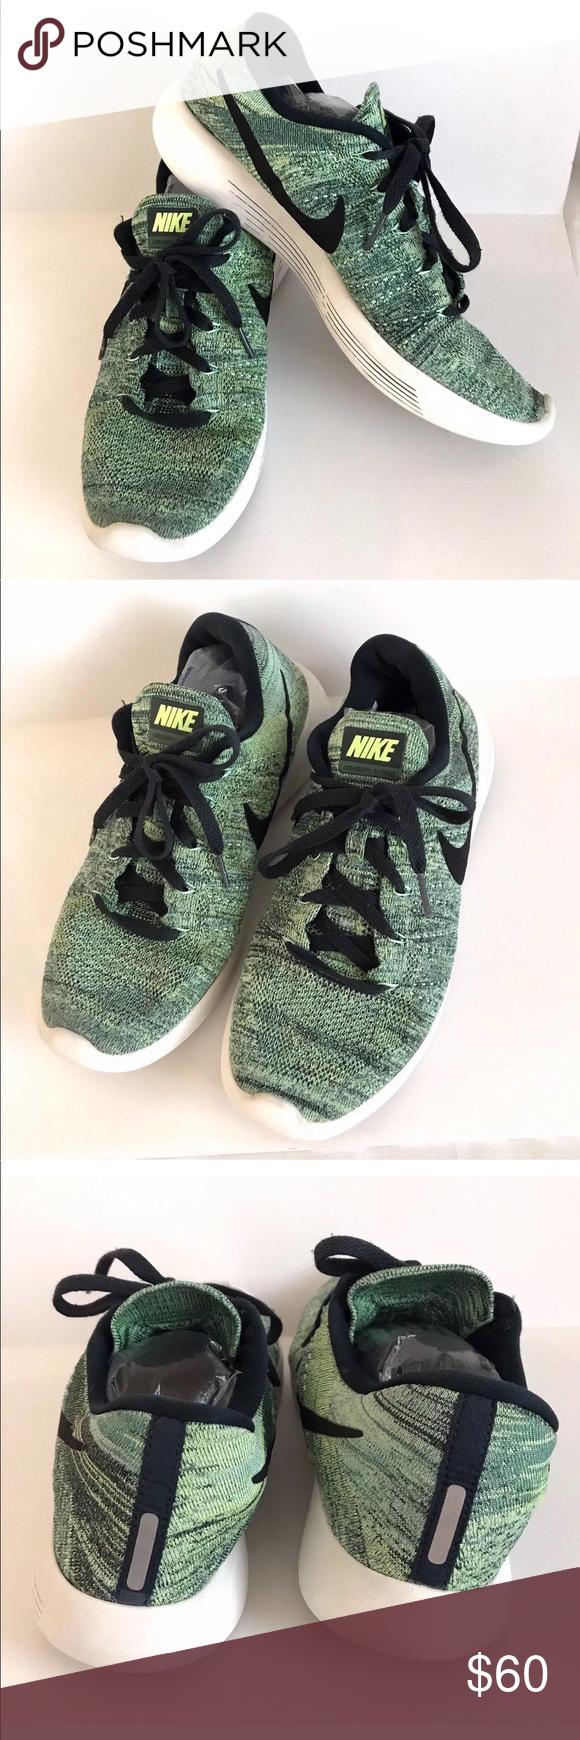 192cbd703ecda Nike Lunarepic Low Flyknit Shoes Sneakers 10.5 Nike Lunarepic Low Flyknit  Running Shoes Sneakers 10.5 Seaweed